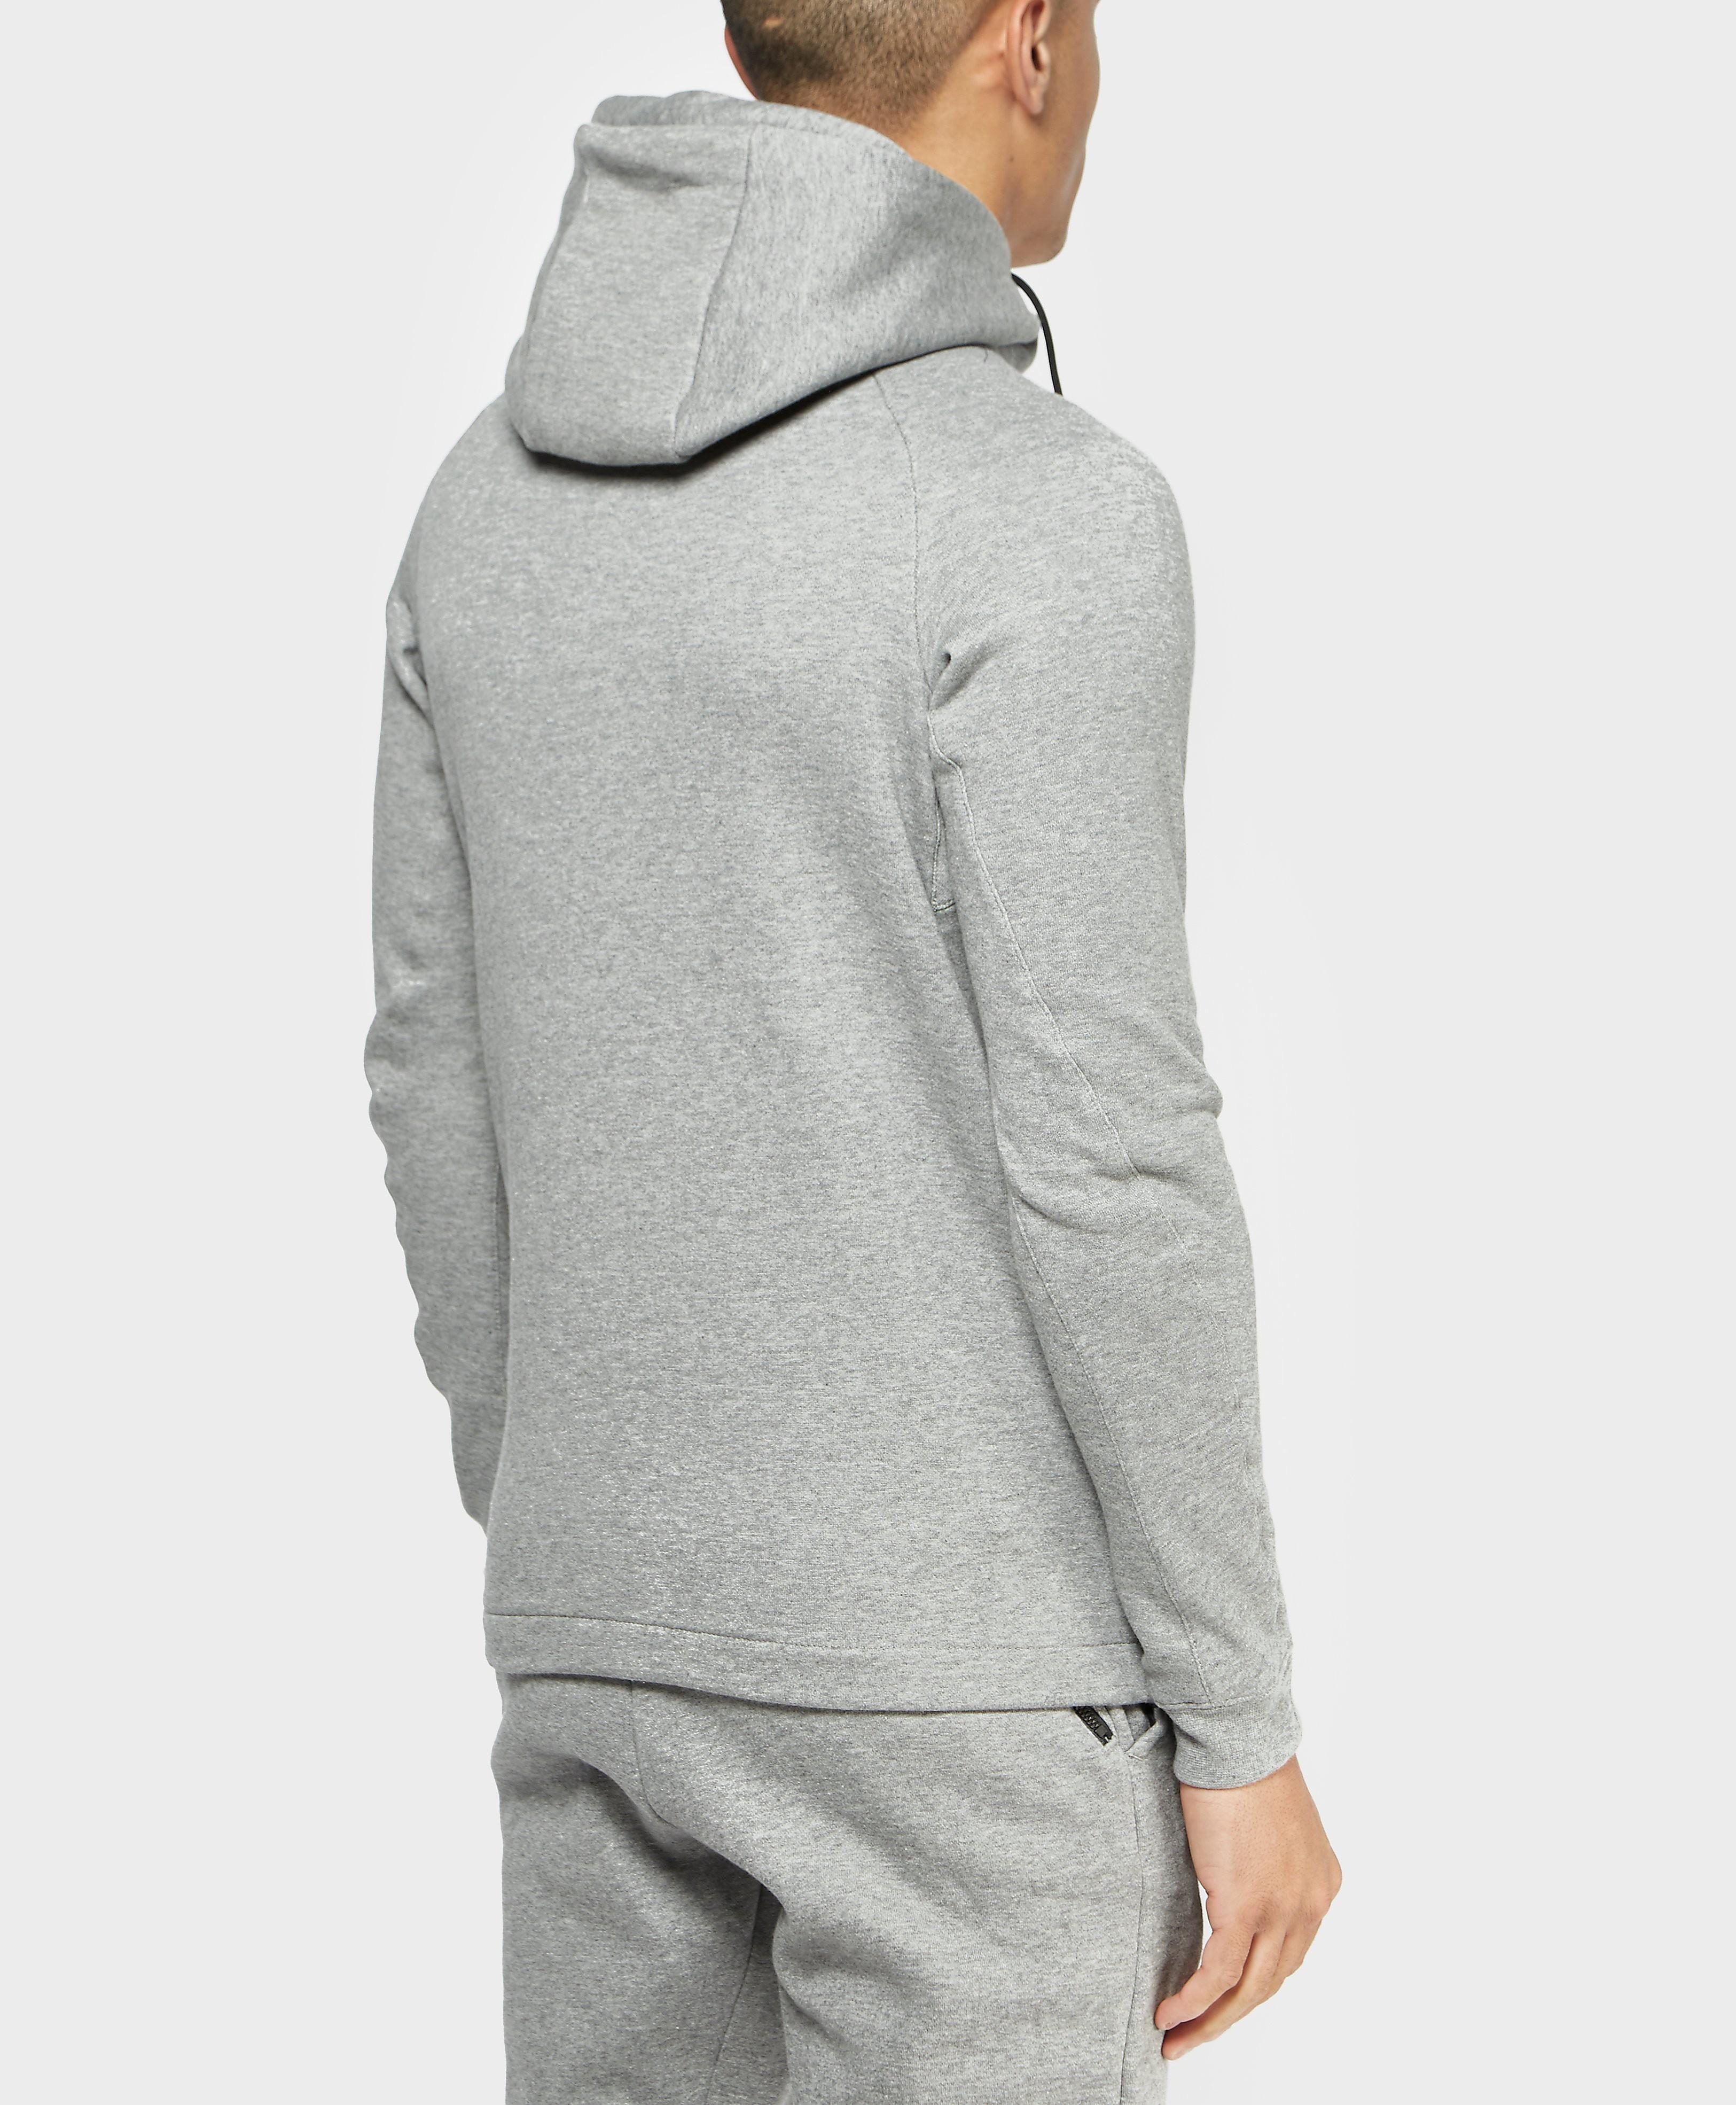 Nike Modern Overhead Hoody